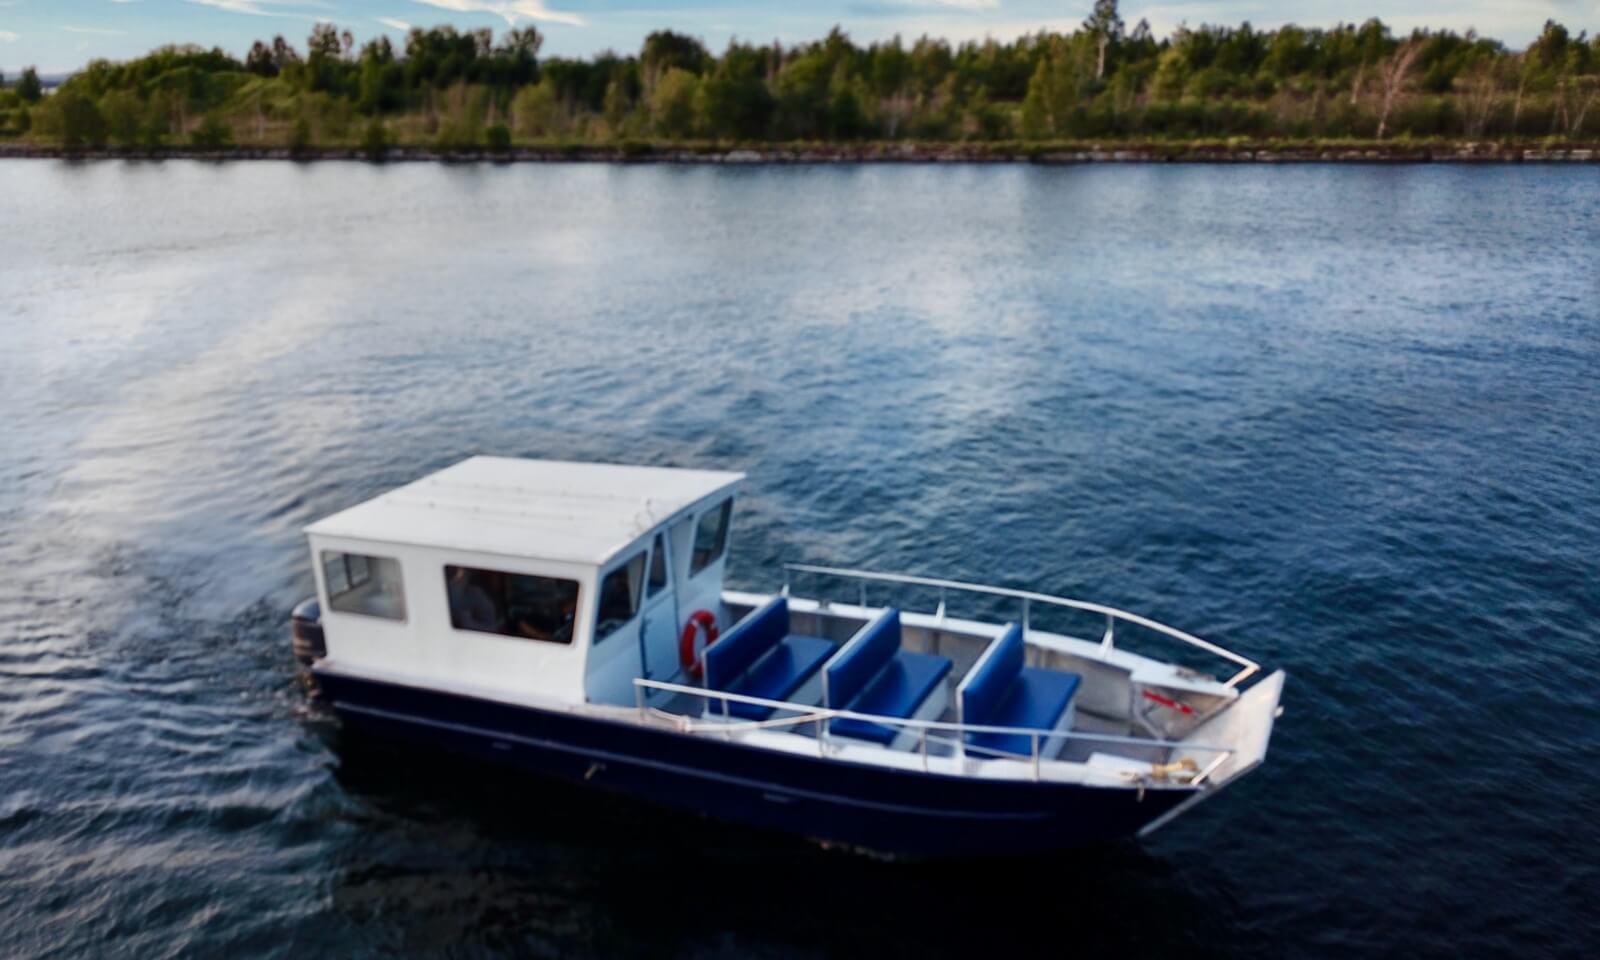 Le Petit OisEau on route to Baie Fine Fjord.